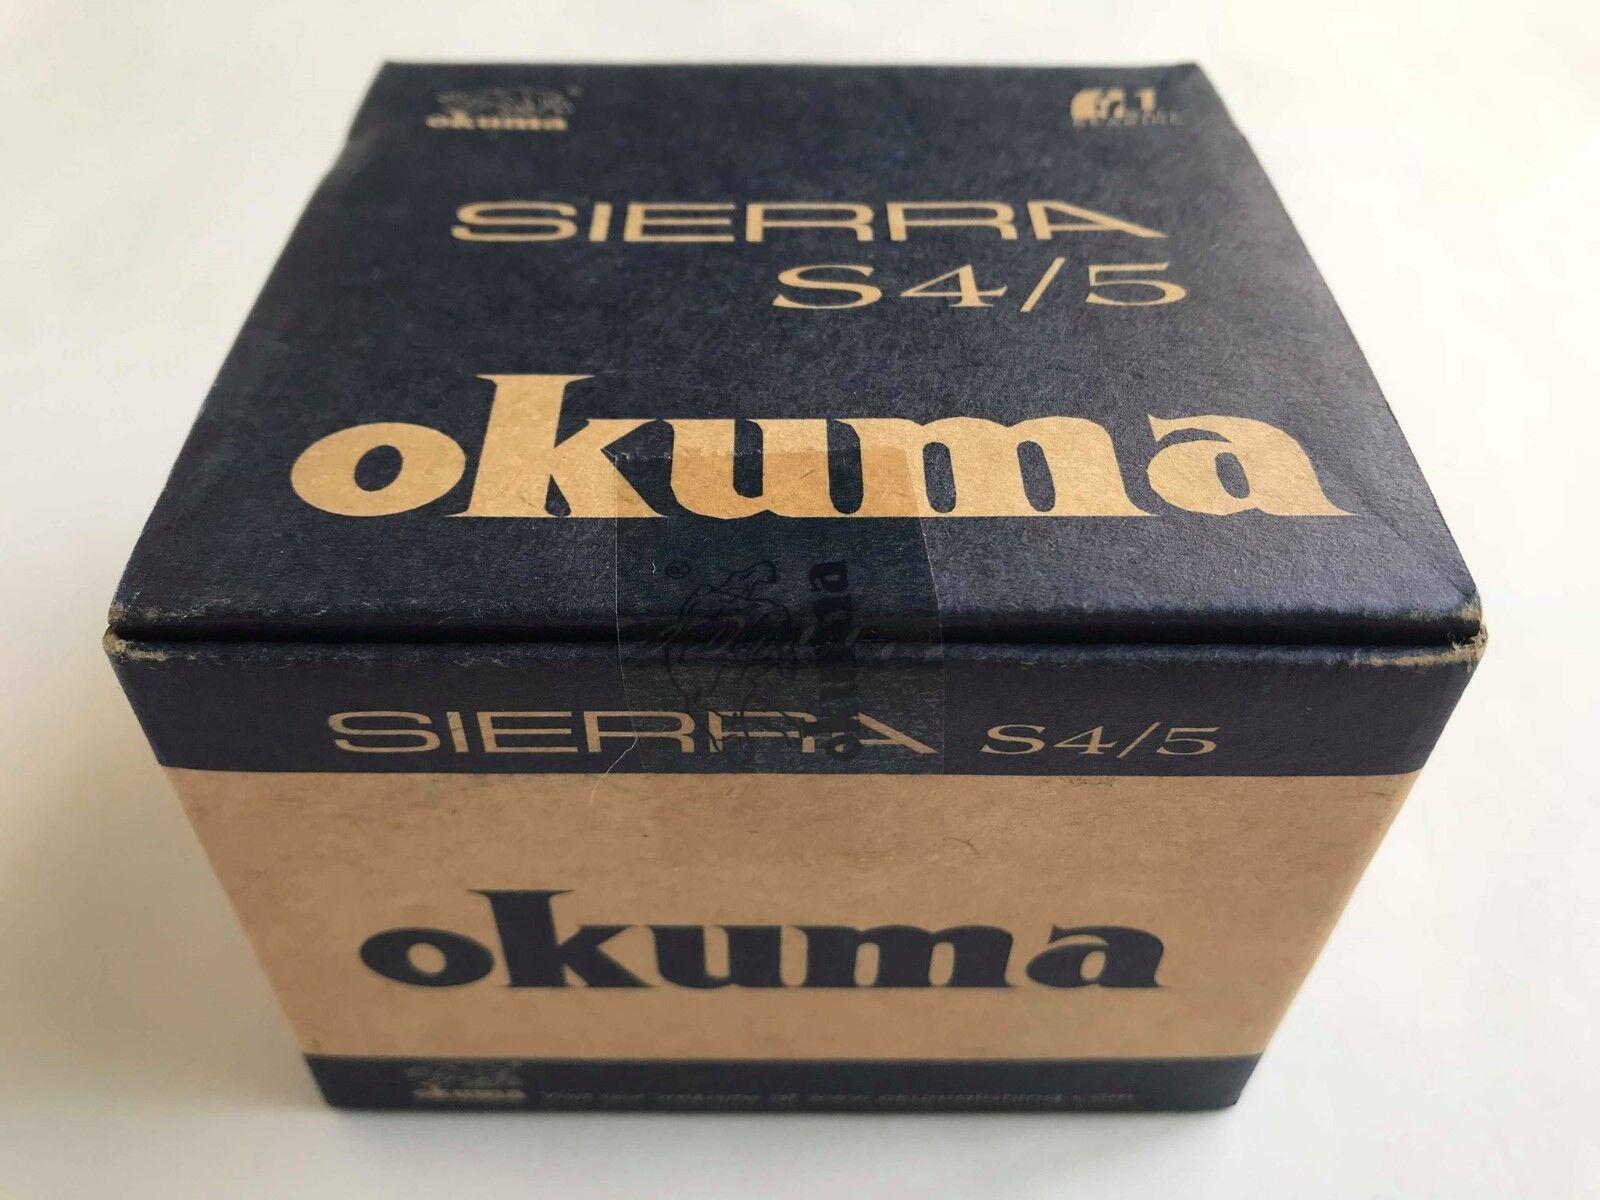 Okuma Sierra fishing Reel S45 fish 1 Btutti orsoing Stainless Steel Fly line 4.5